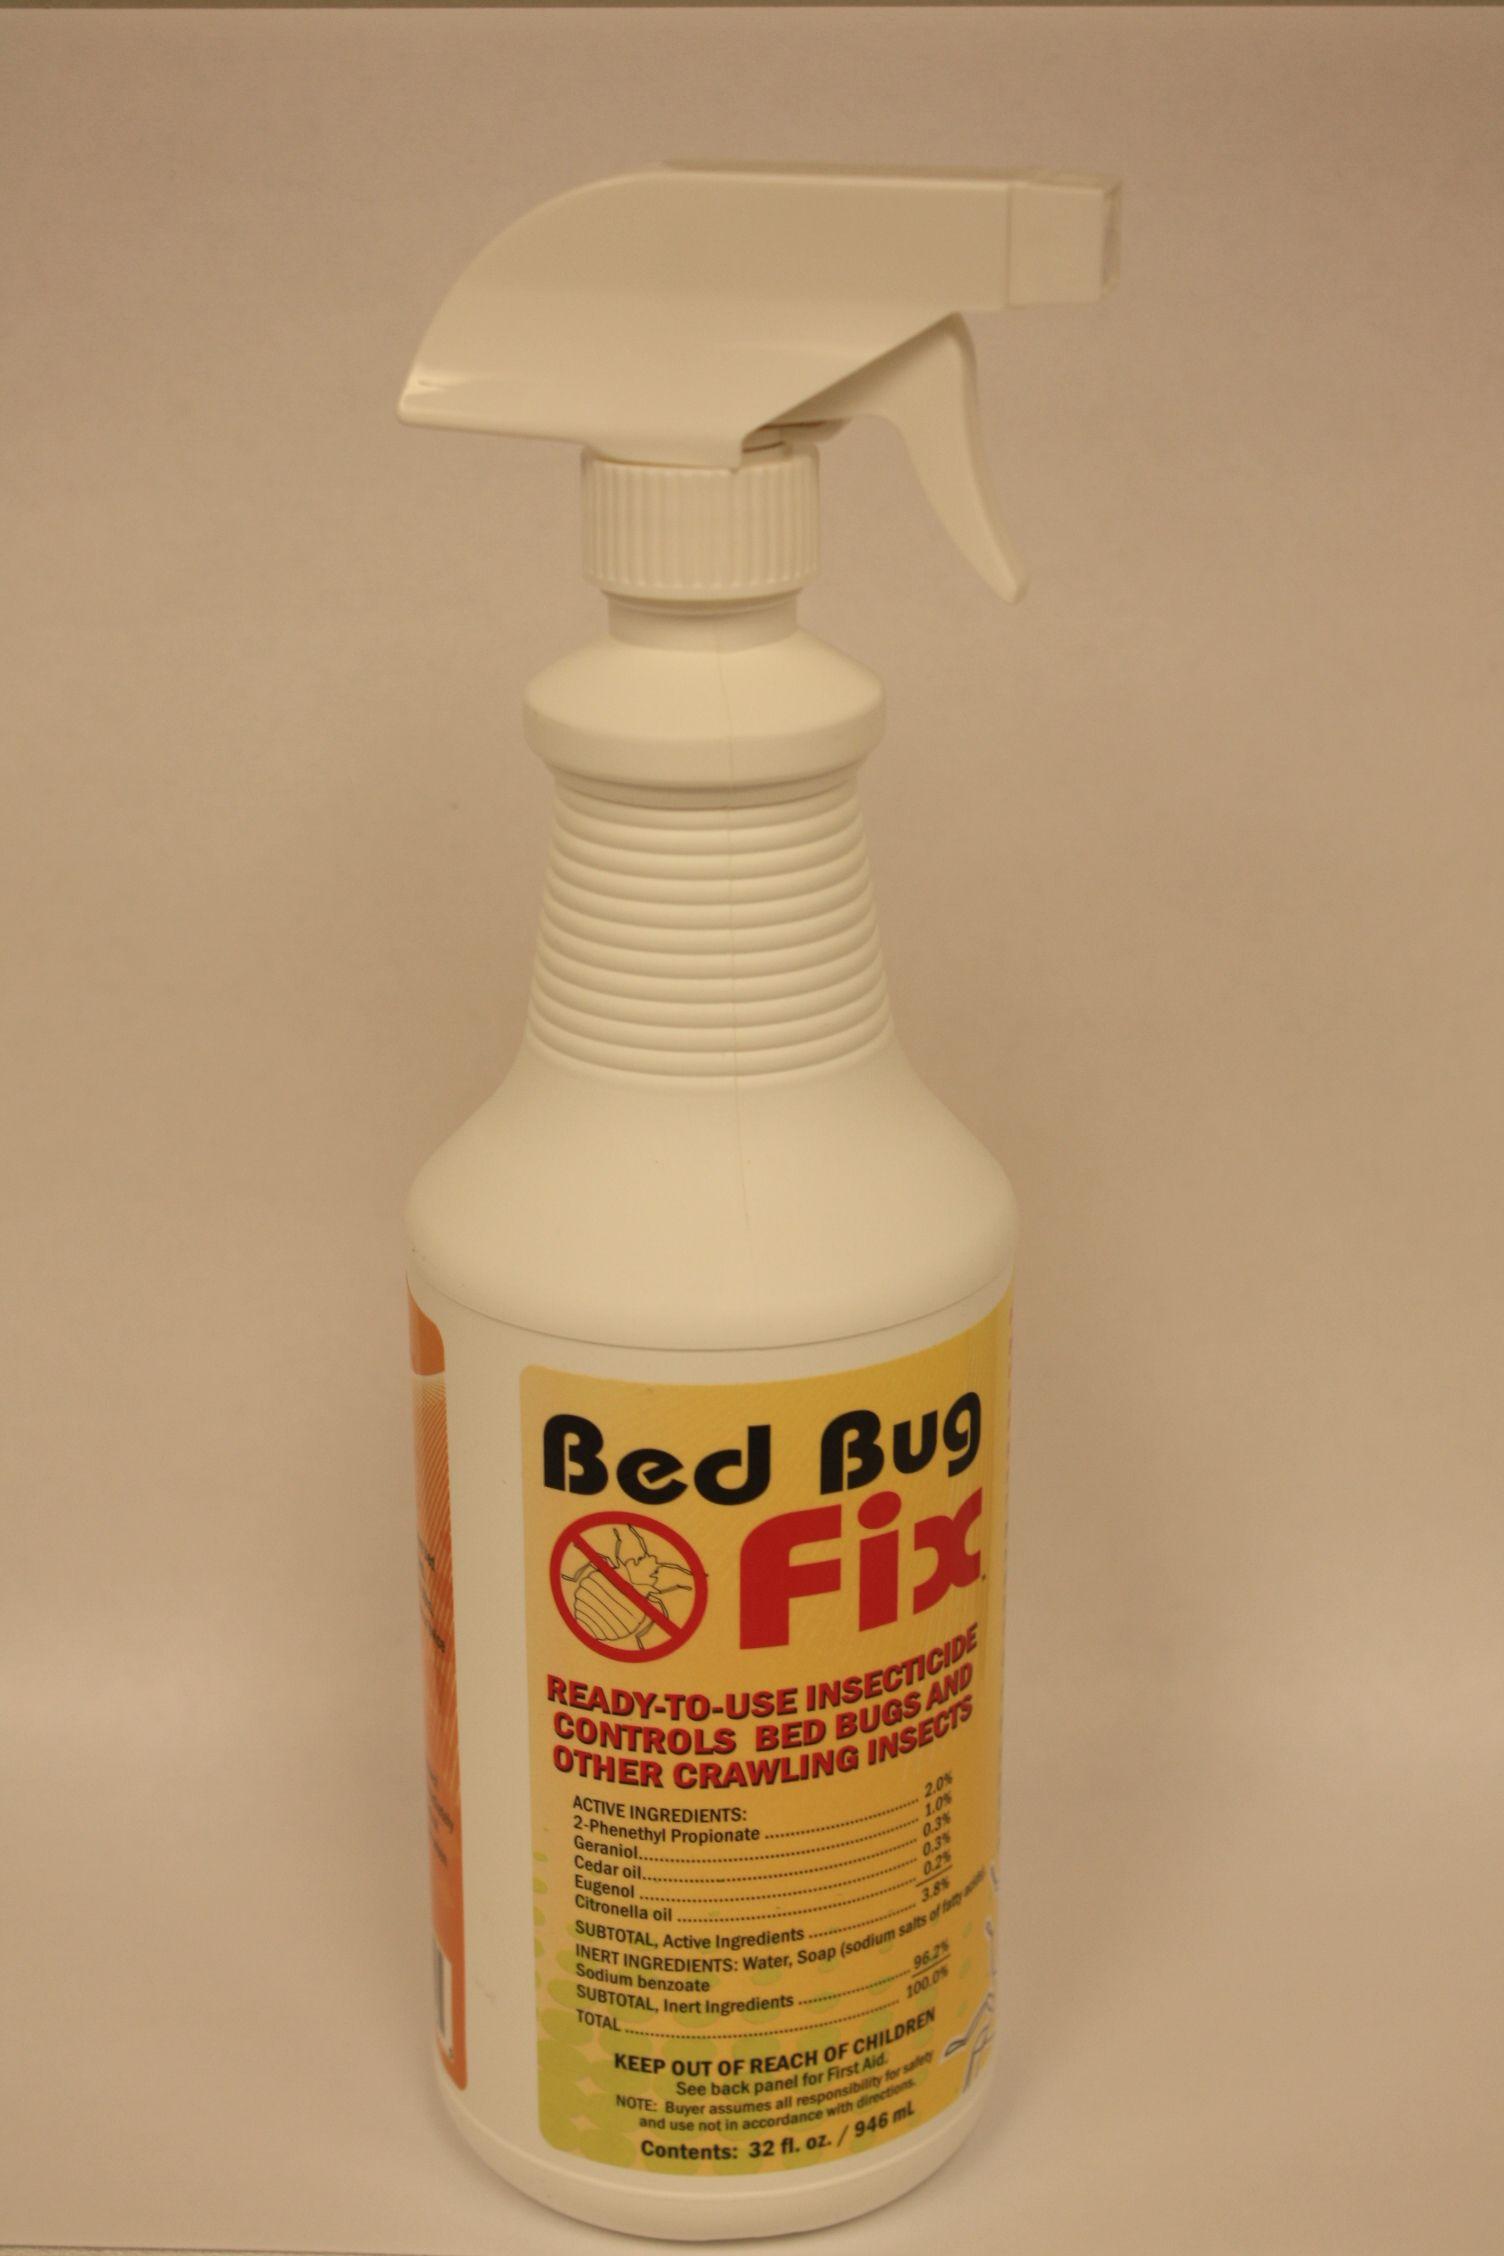 Bed Bug Fix spray bottle Bed bugs, Bugs, Spray bottle